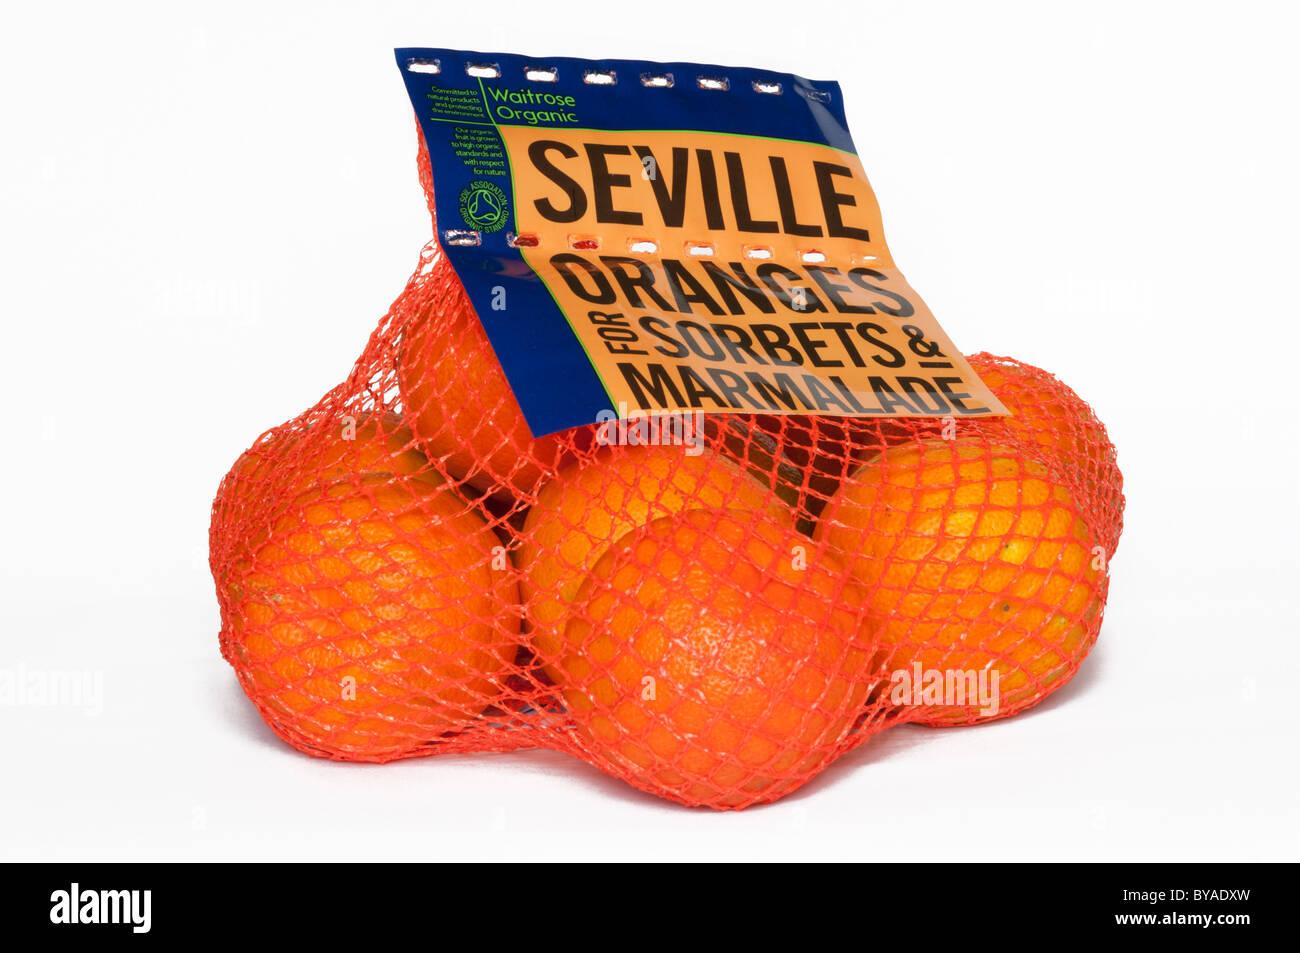 A bag of Seville oranges for making Marmalade. - Stock Image